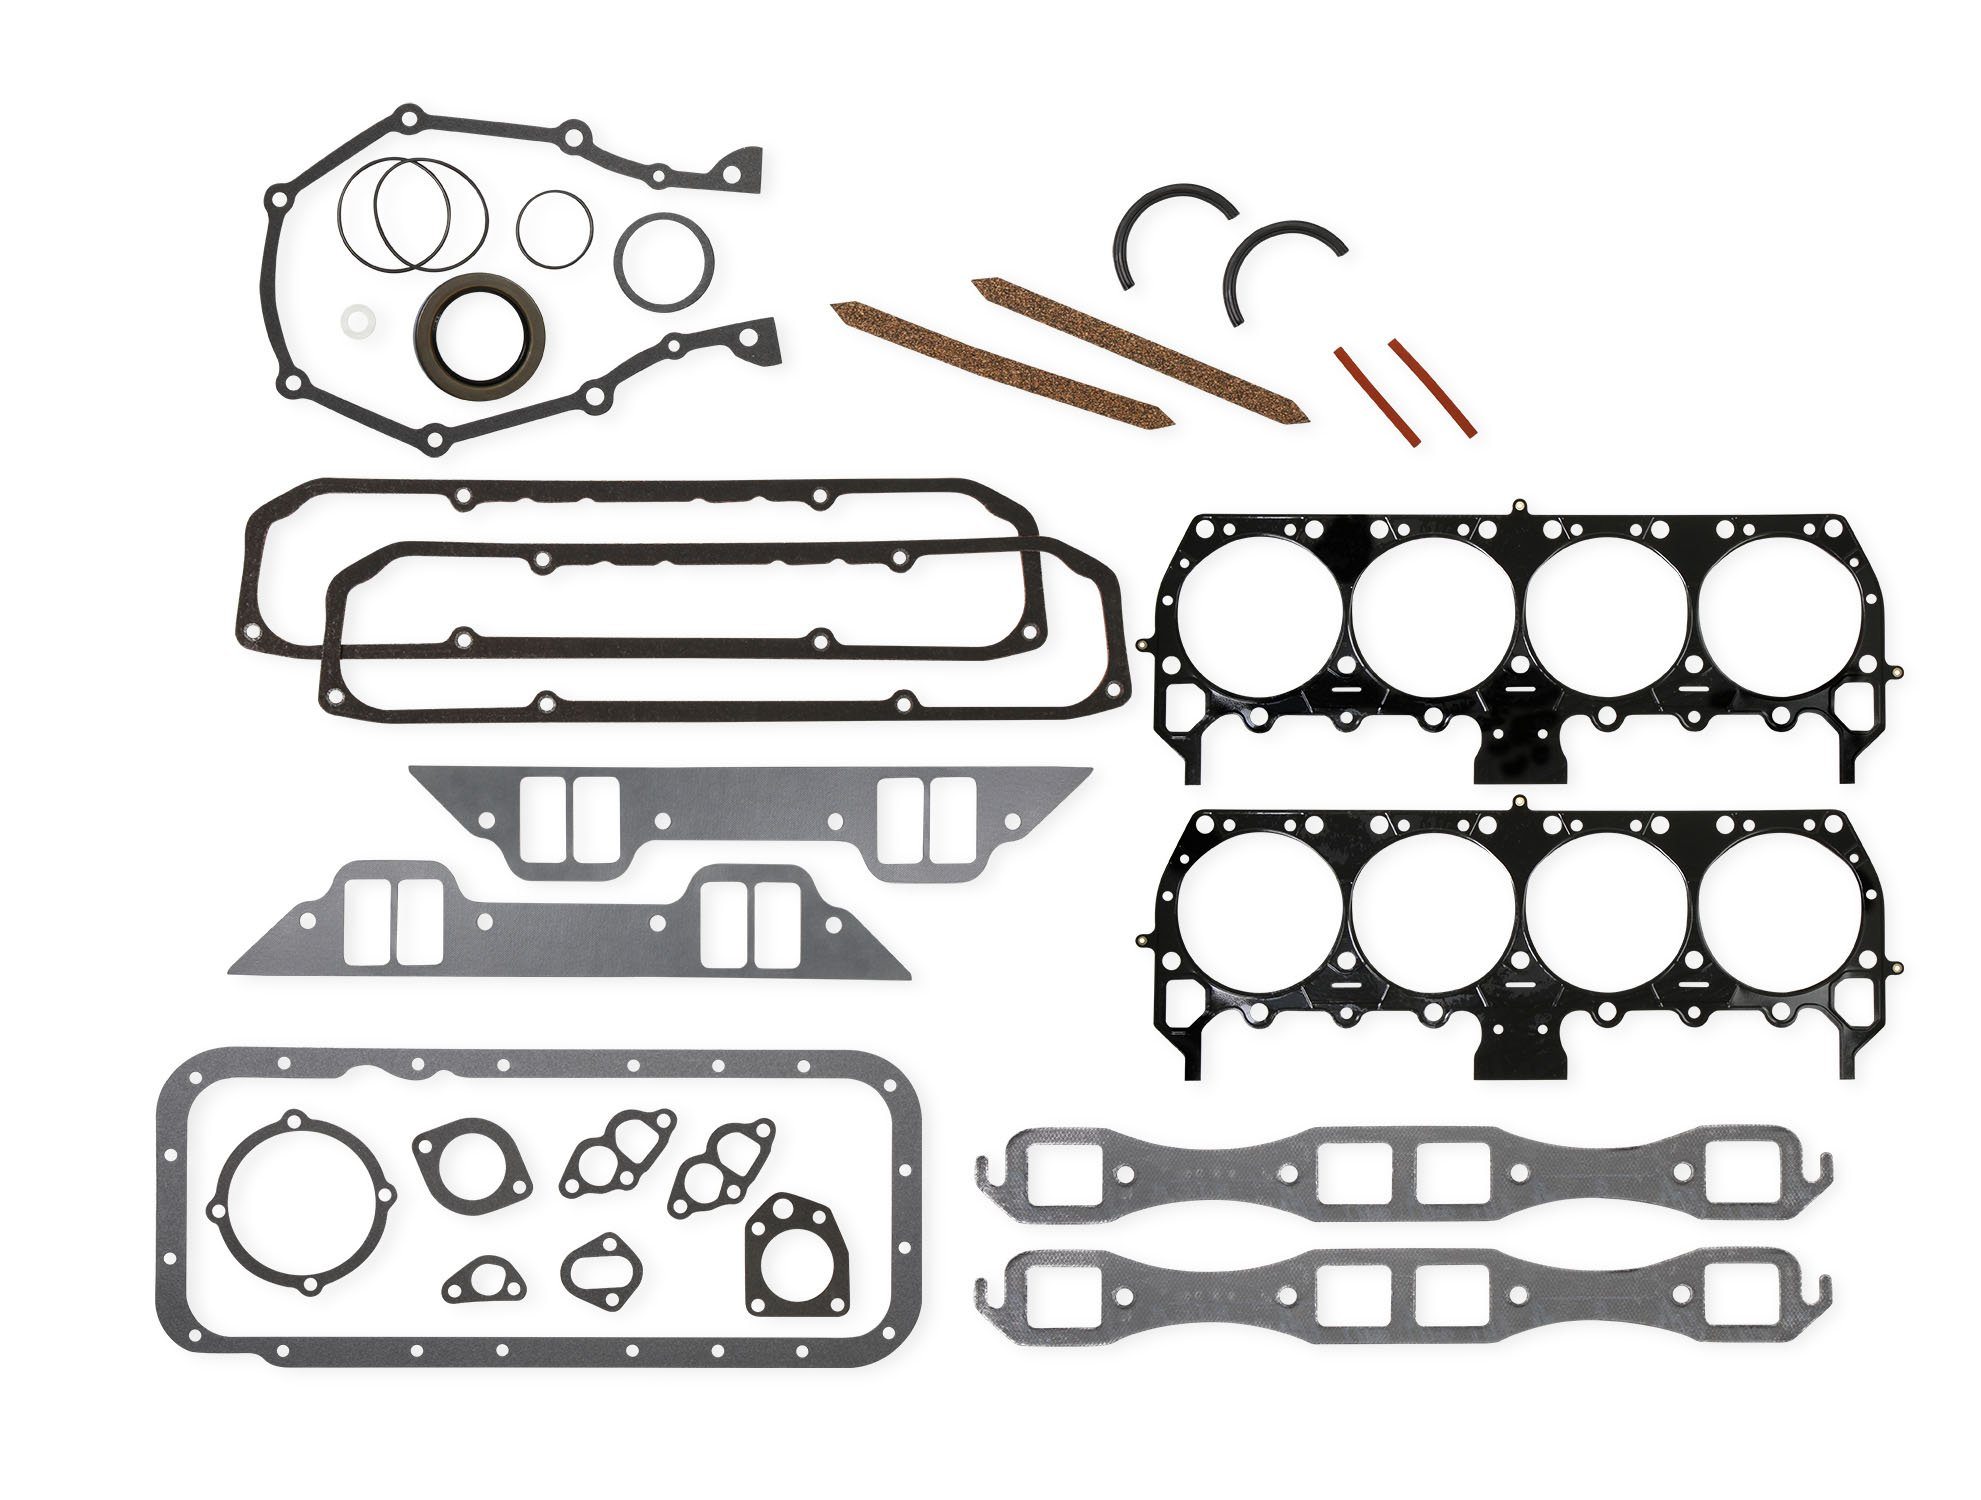 Mr Gasket G Mr Gasket Premium Engine Overhaul Kit